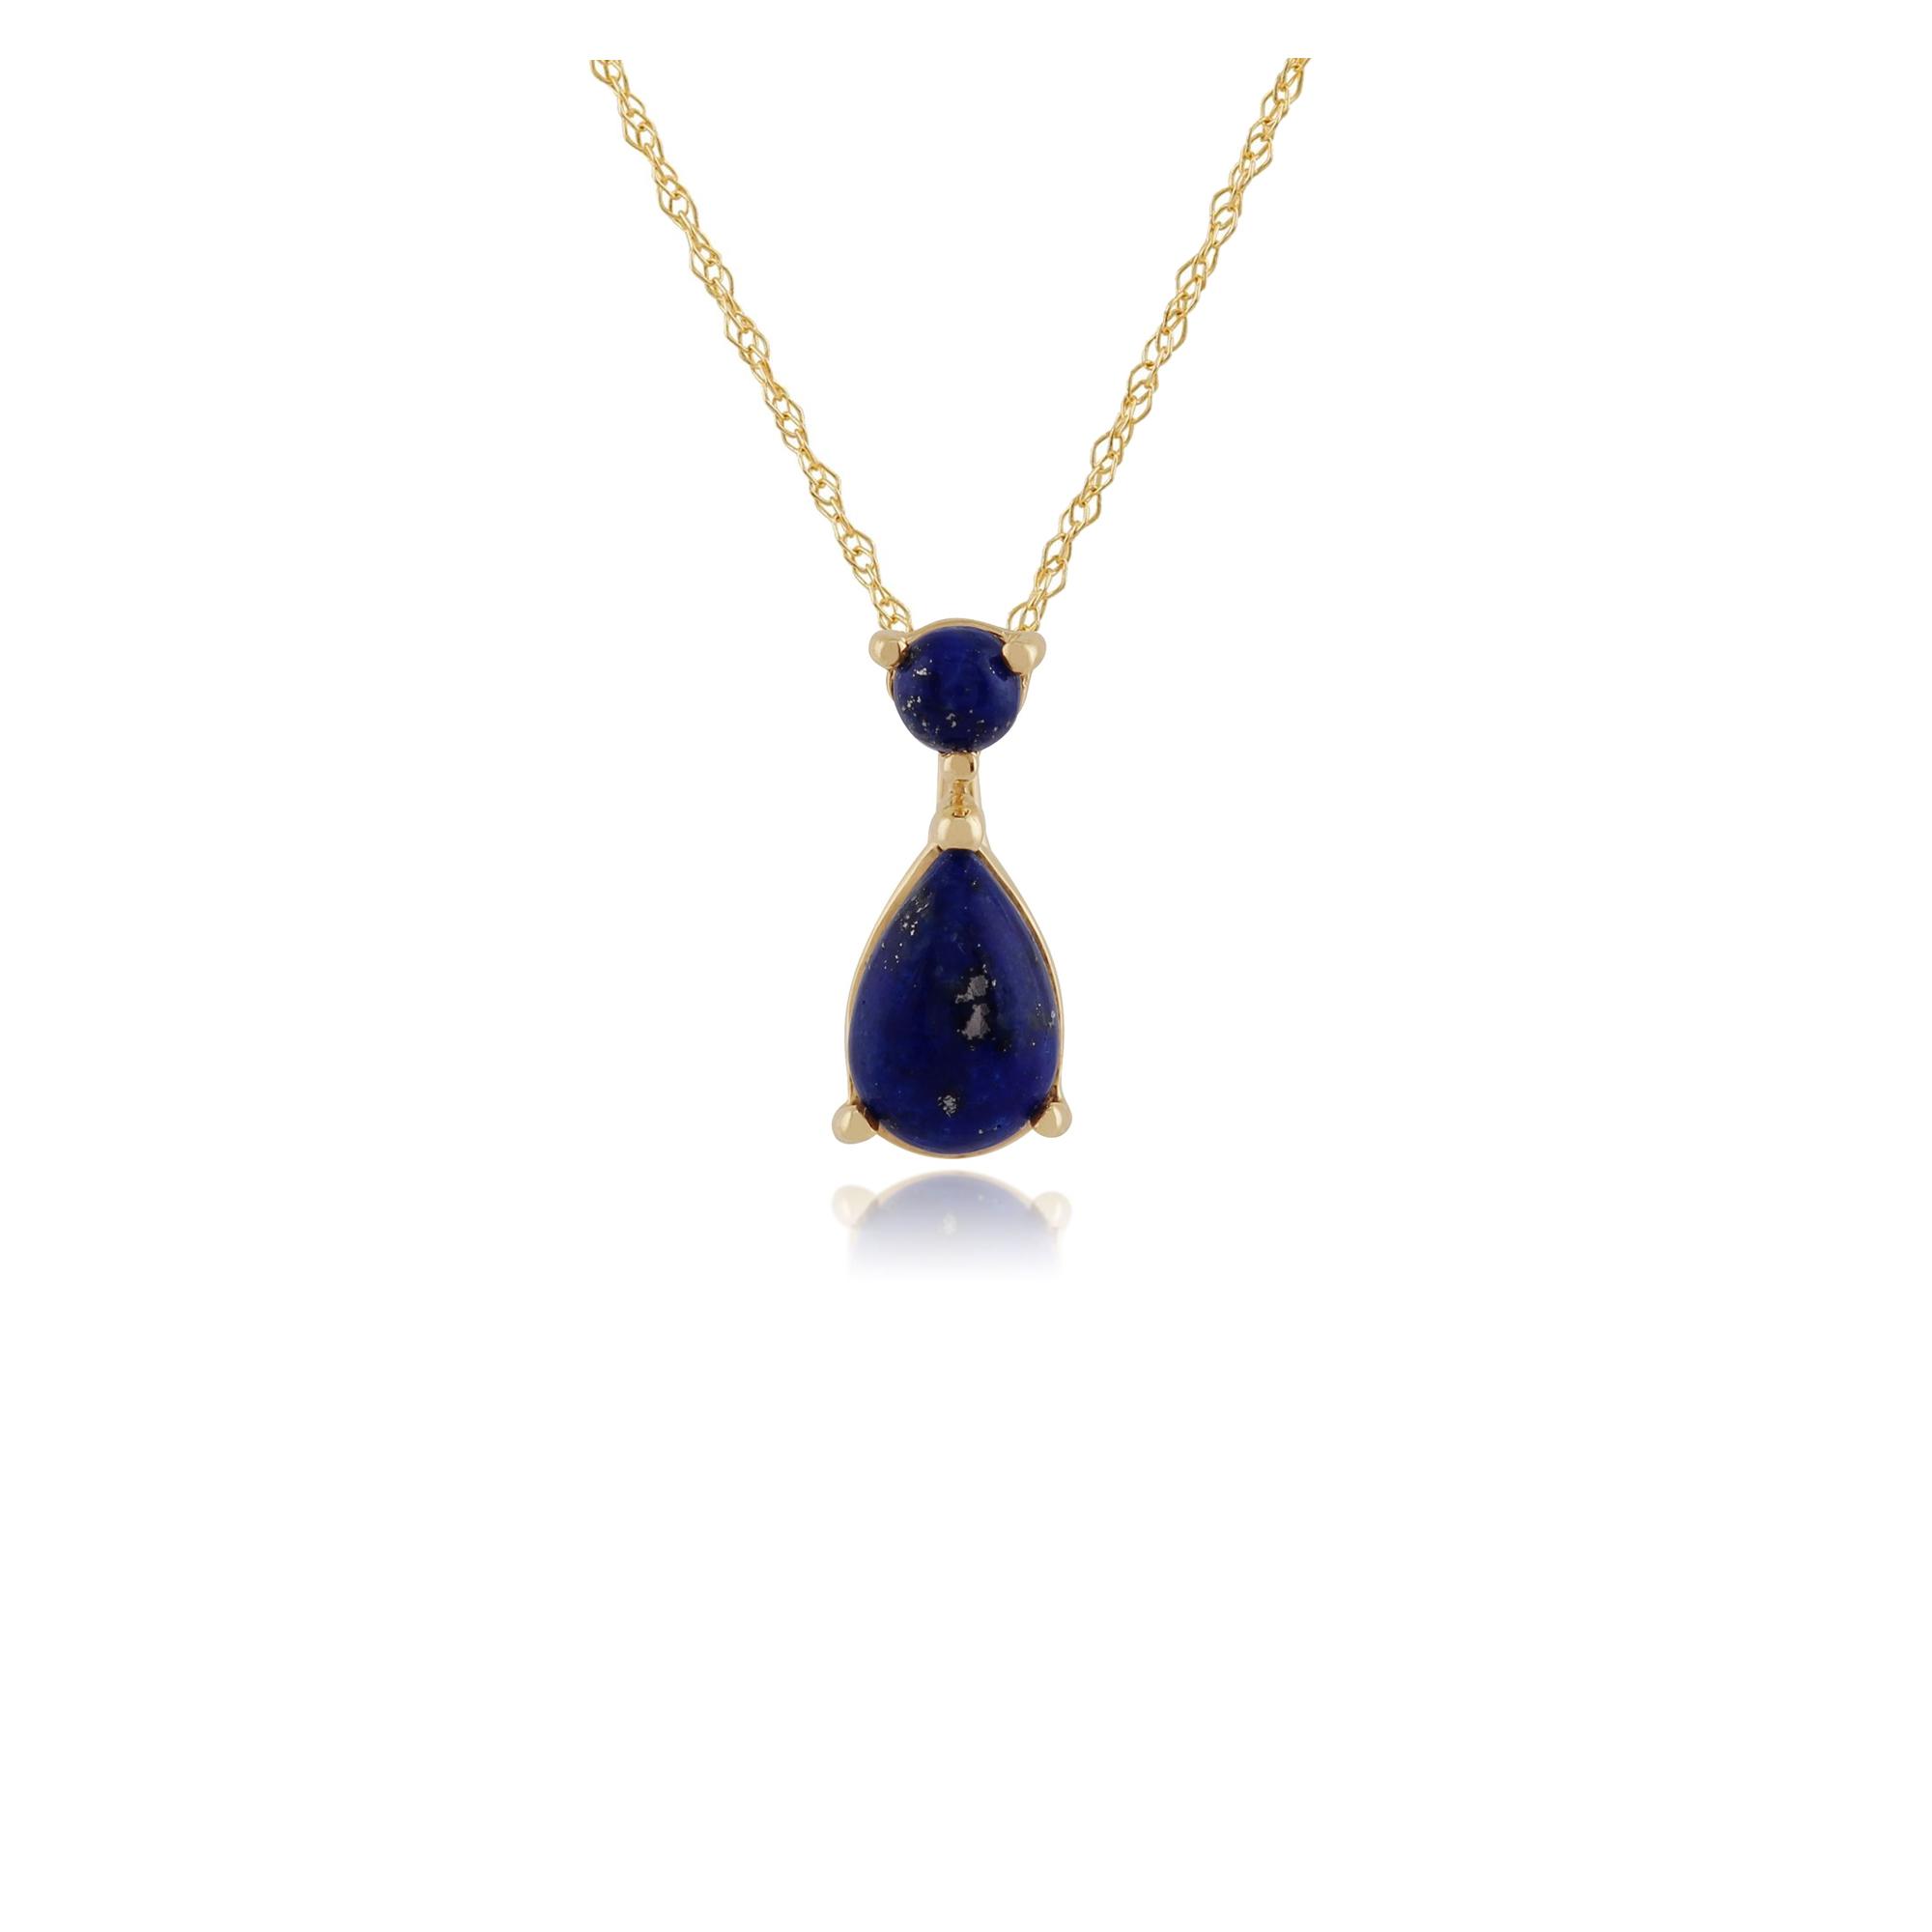 Gemondo 9ct Yellow Gold 0.56ct Lapis Lazuli Single Stone Oval Framed Ring